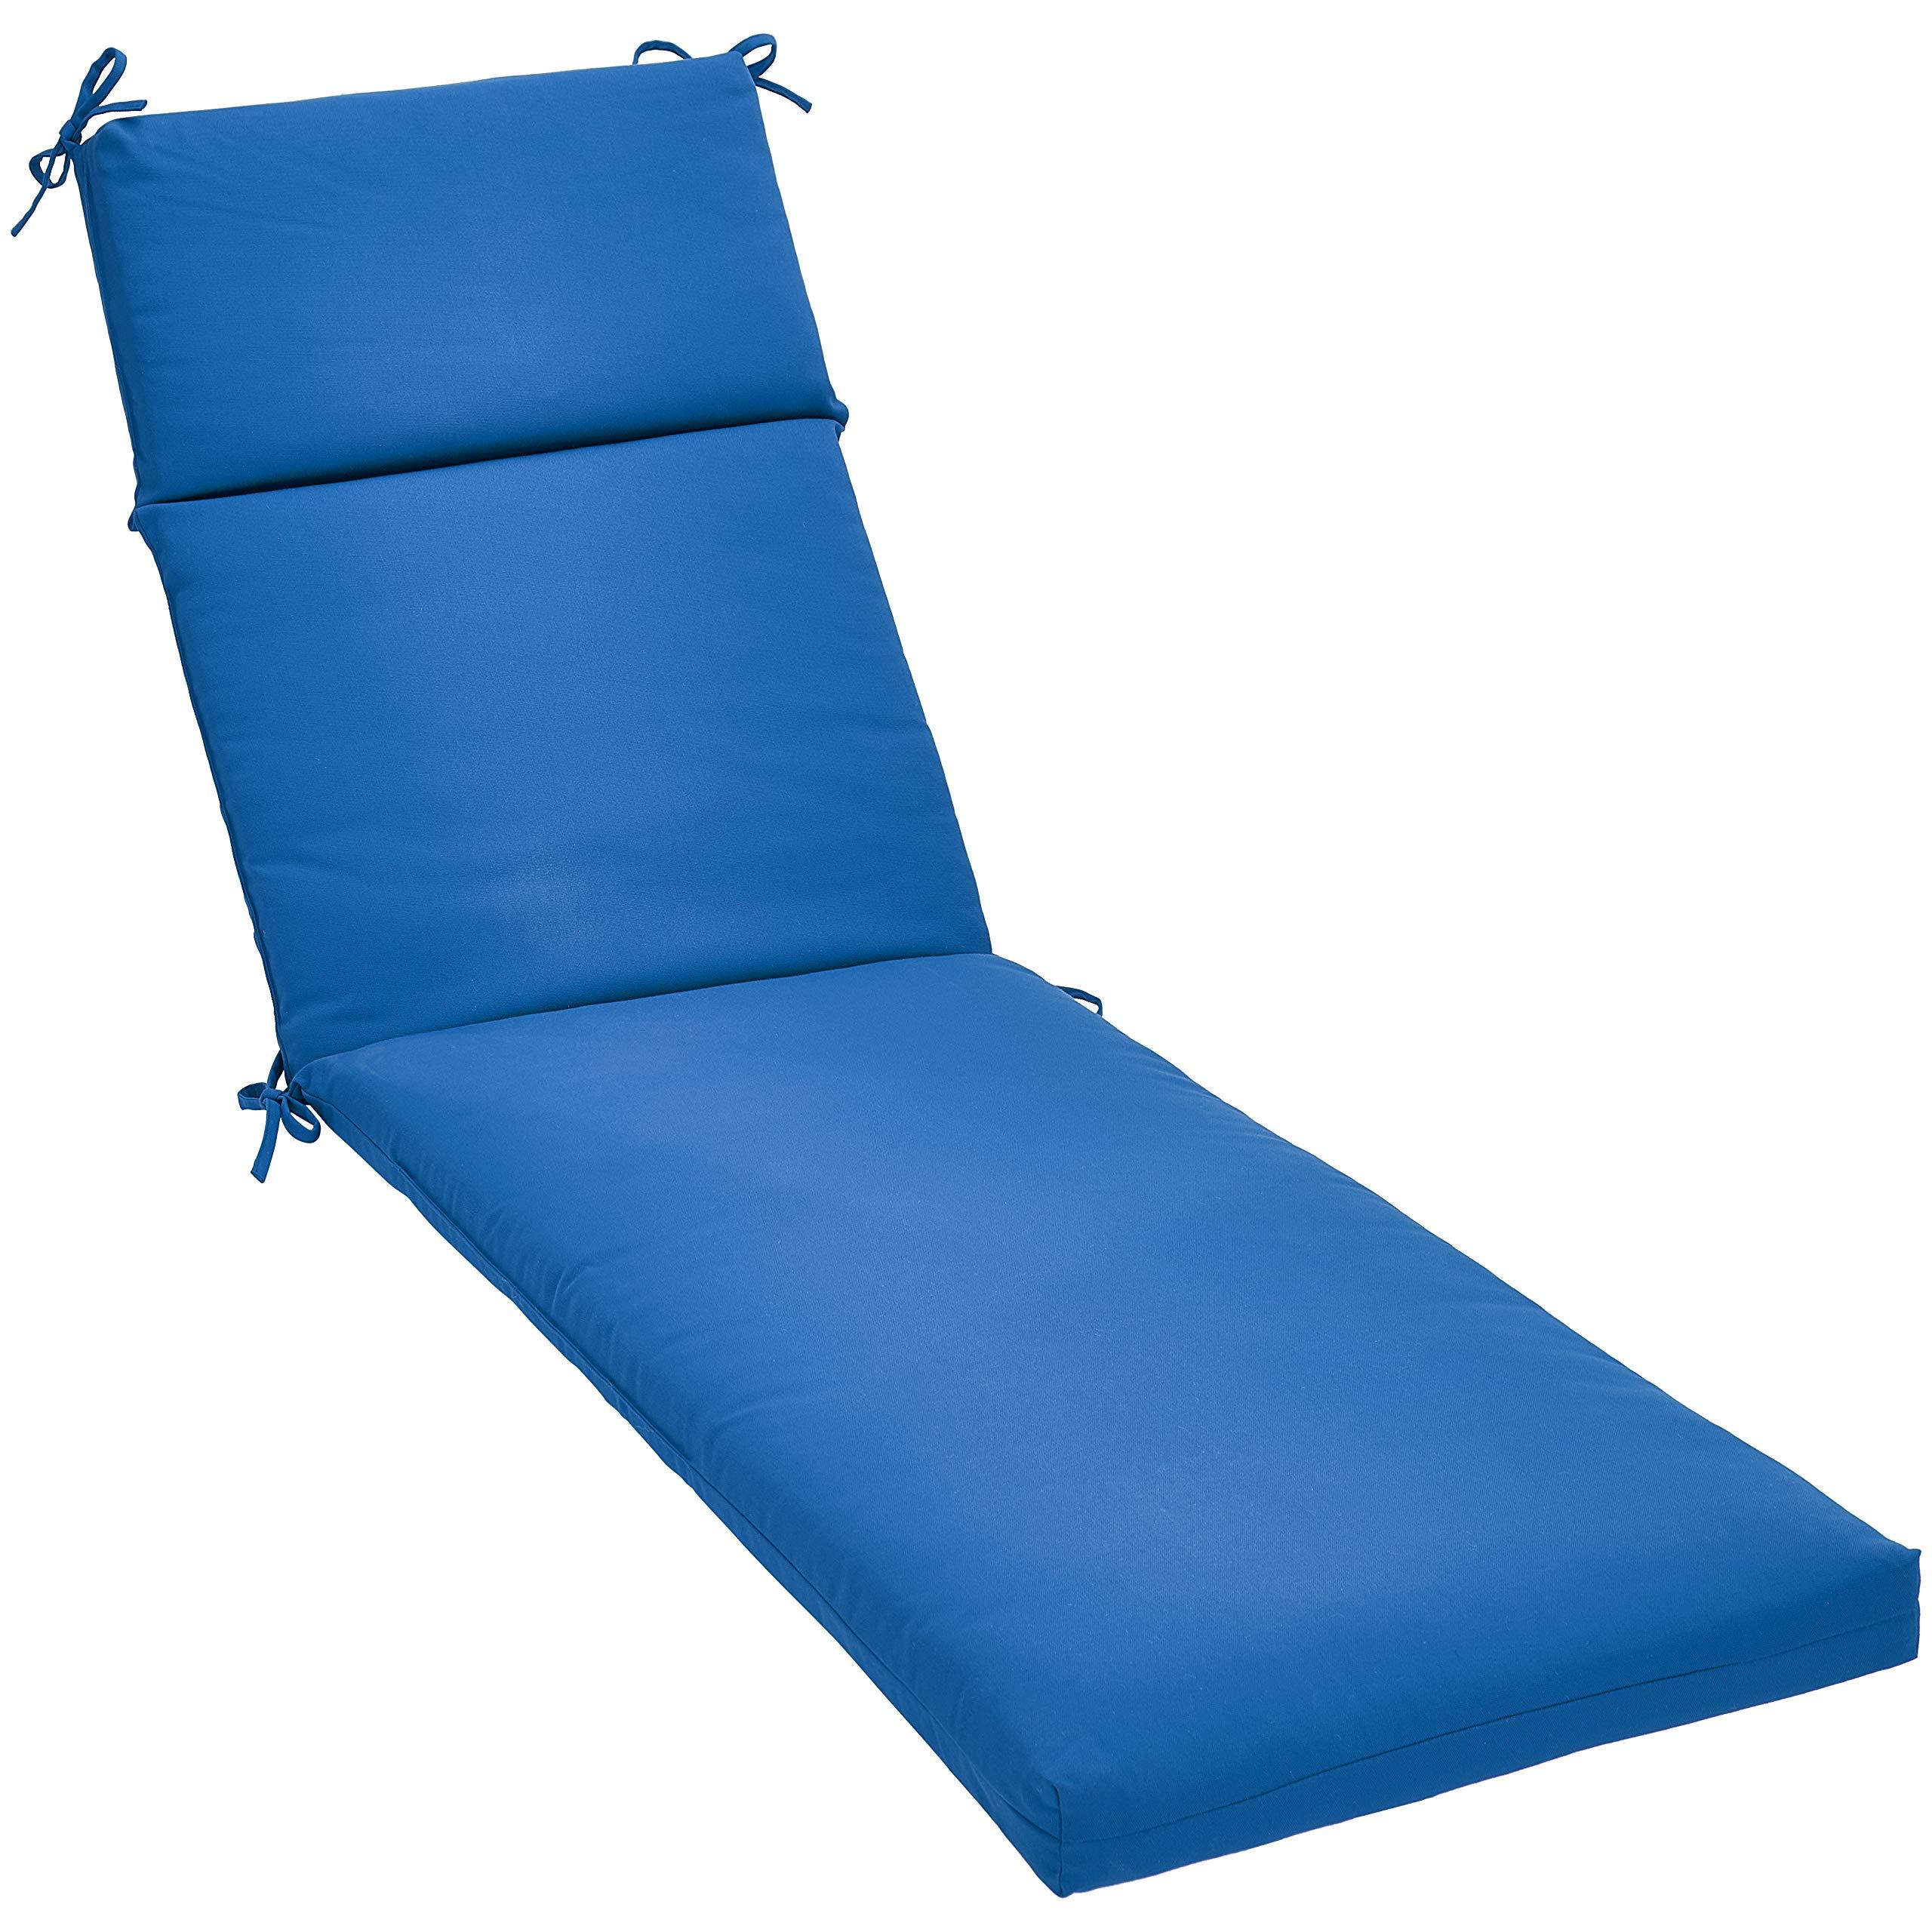 AmazonBasics Outdoor Lounger Patio Cushion - Blue by AmazonBasics